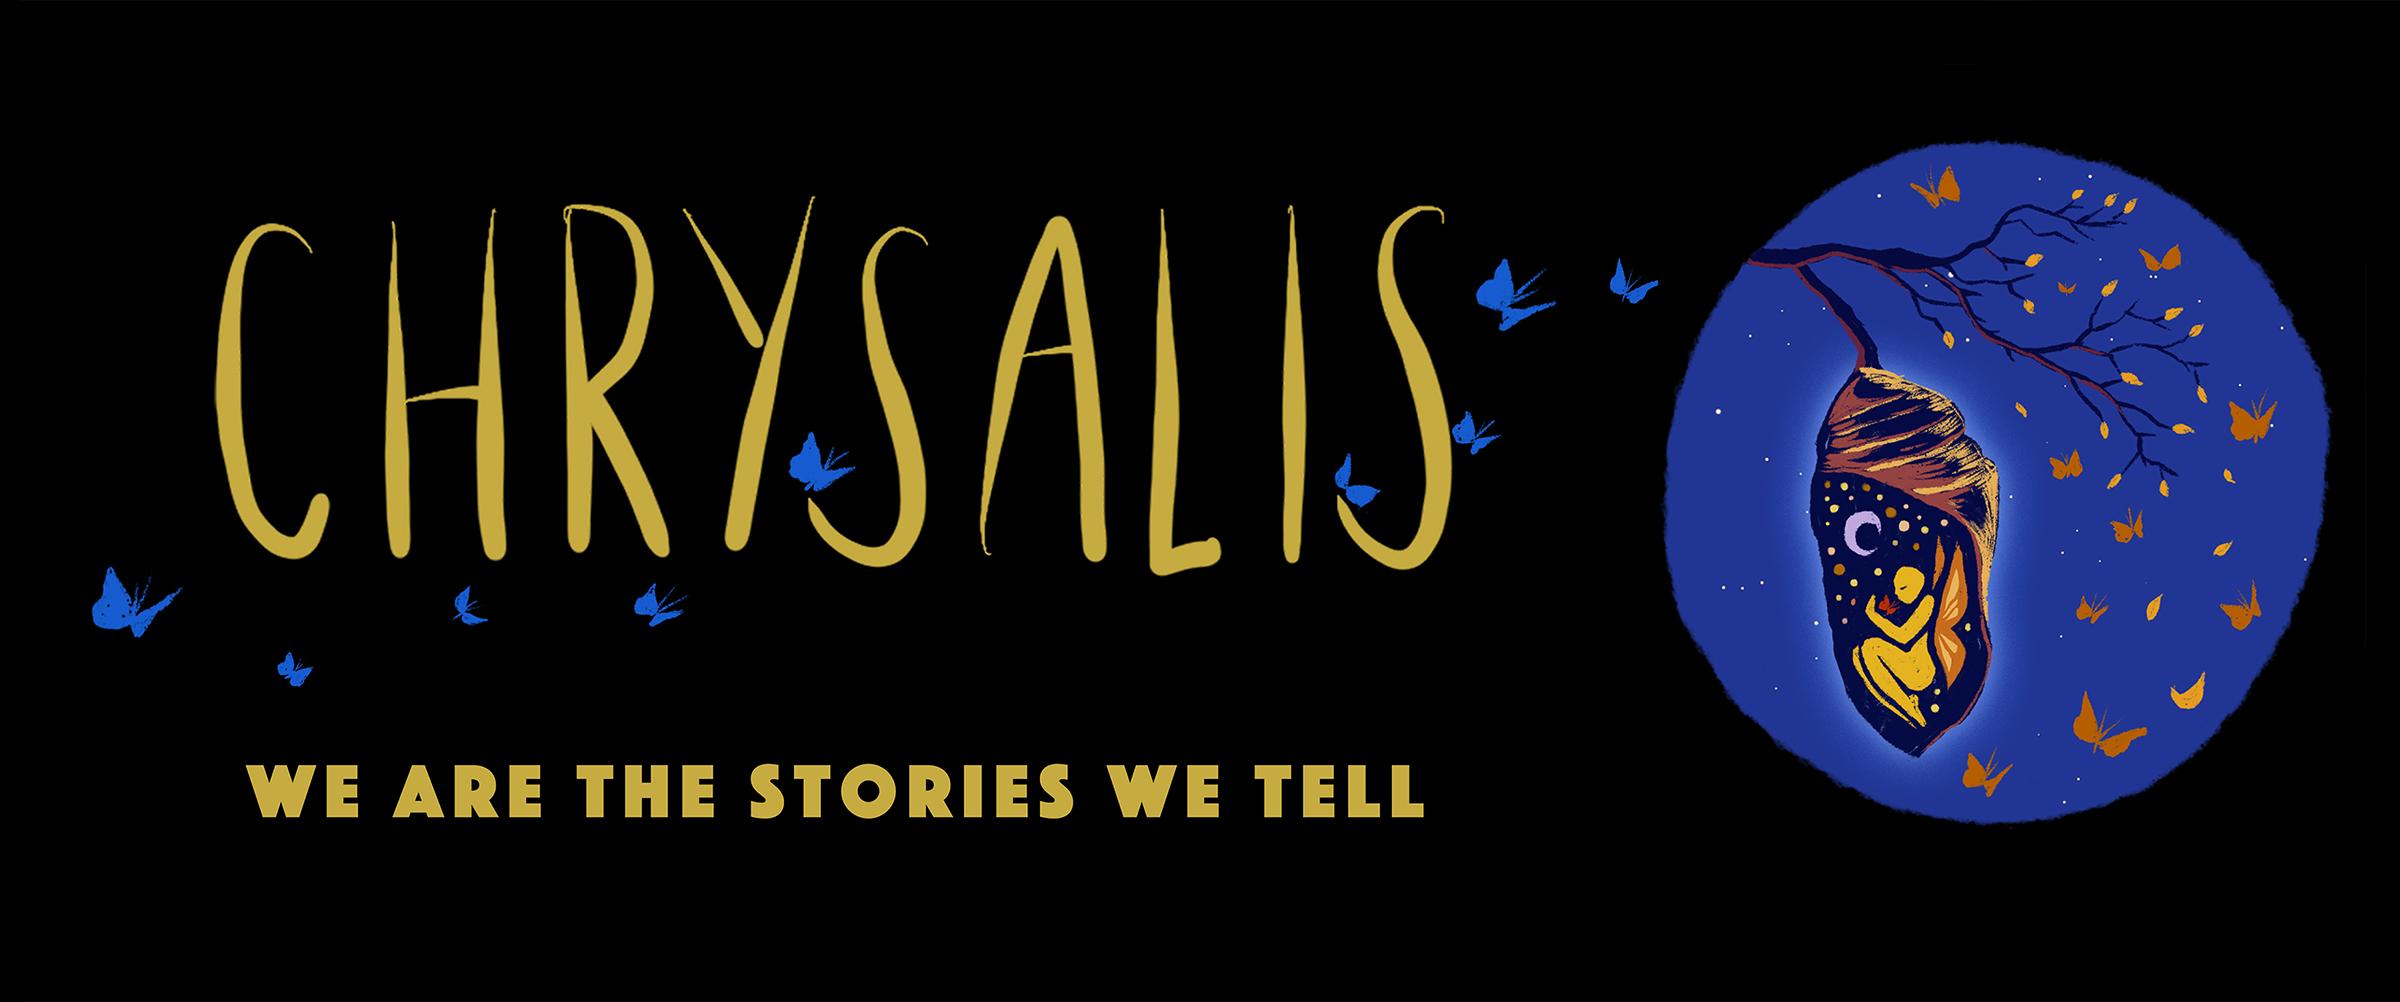 Chrysalis_banner tagline small.jpg